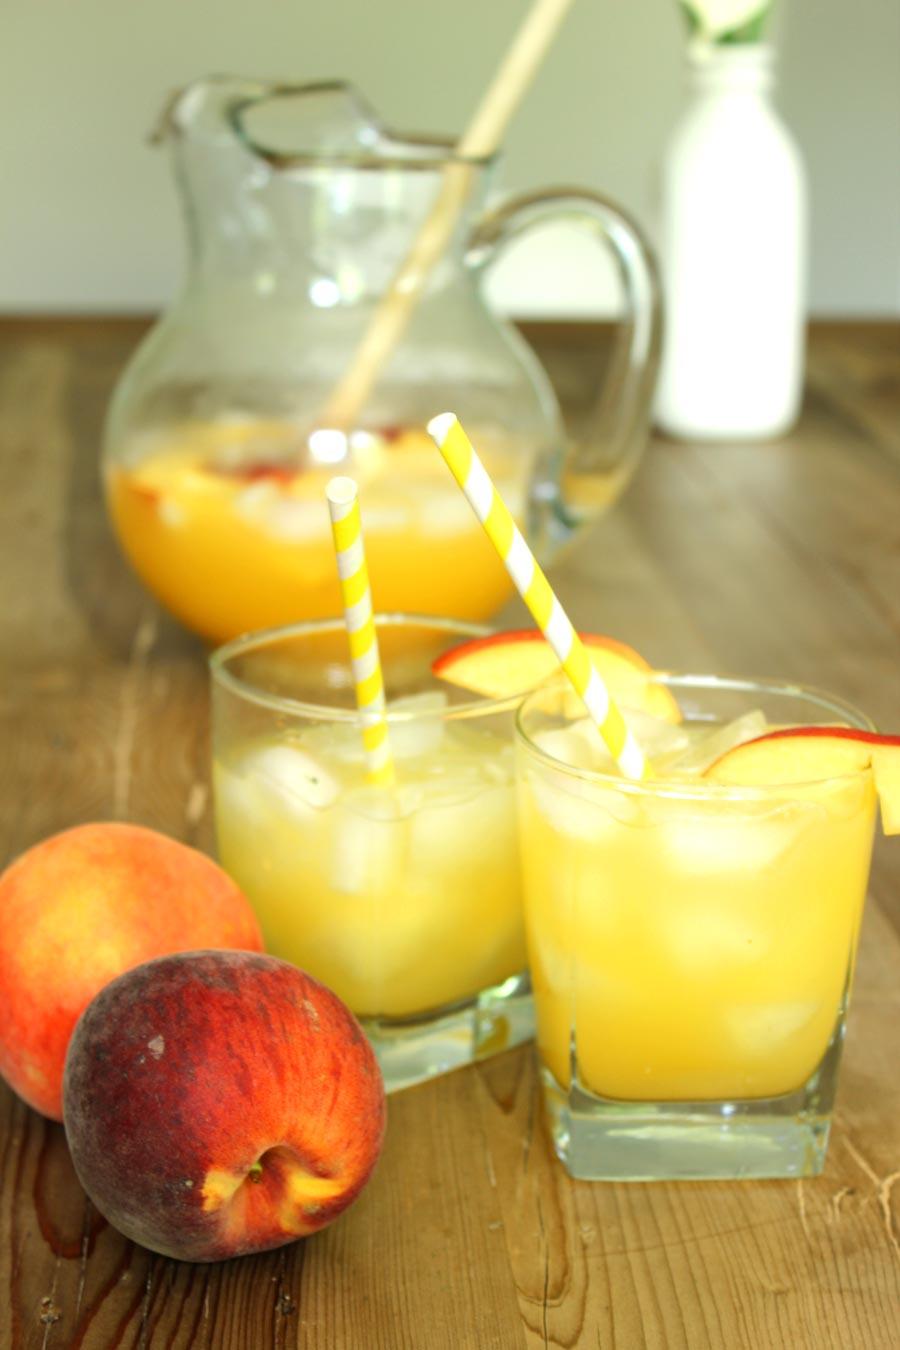 Peach Lemonade - a great little change up to your standard lemonade!